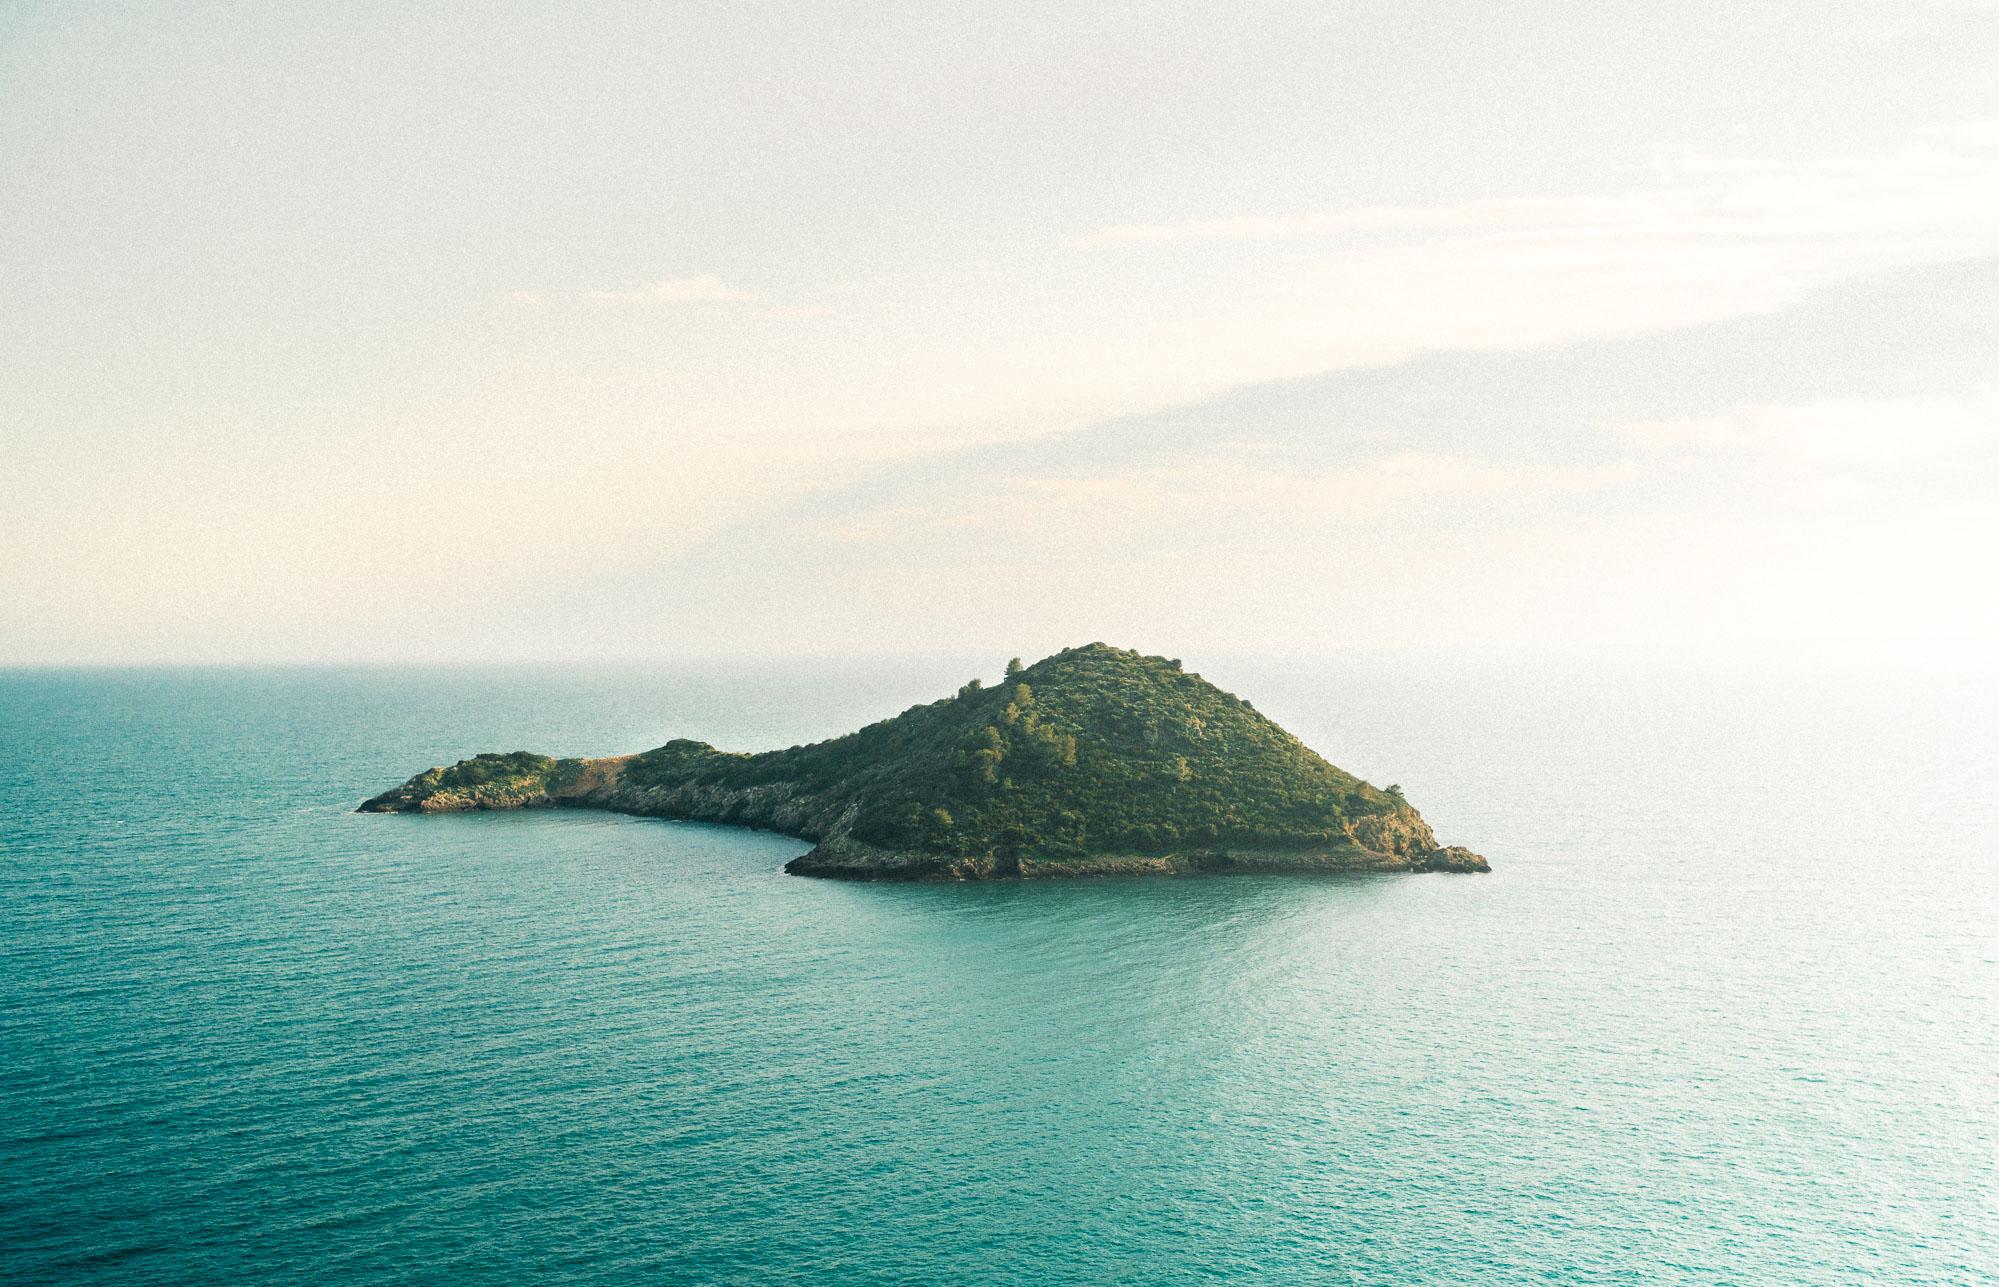 Islands off the coast of southern Tuscany, Italy near Porto Ercole